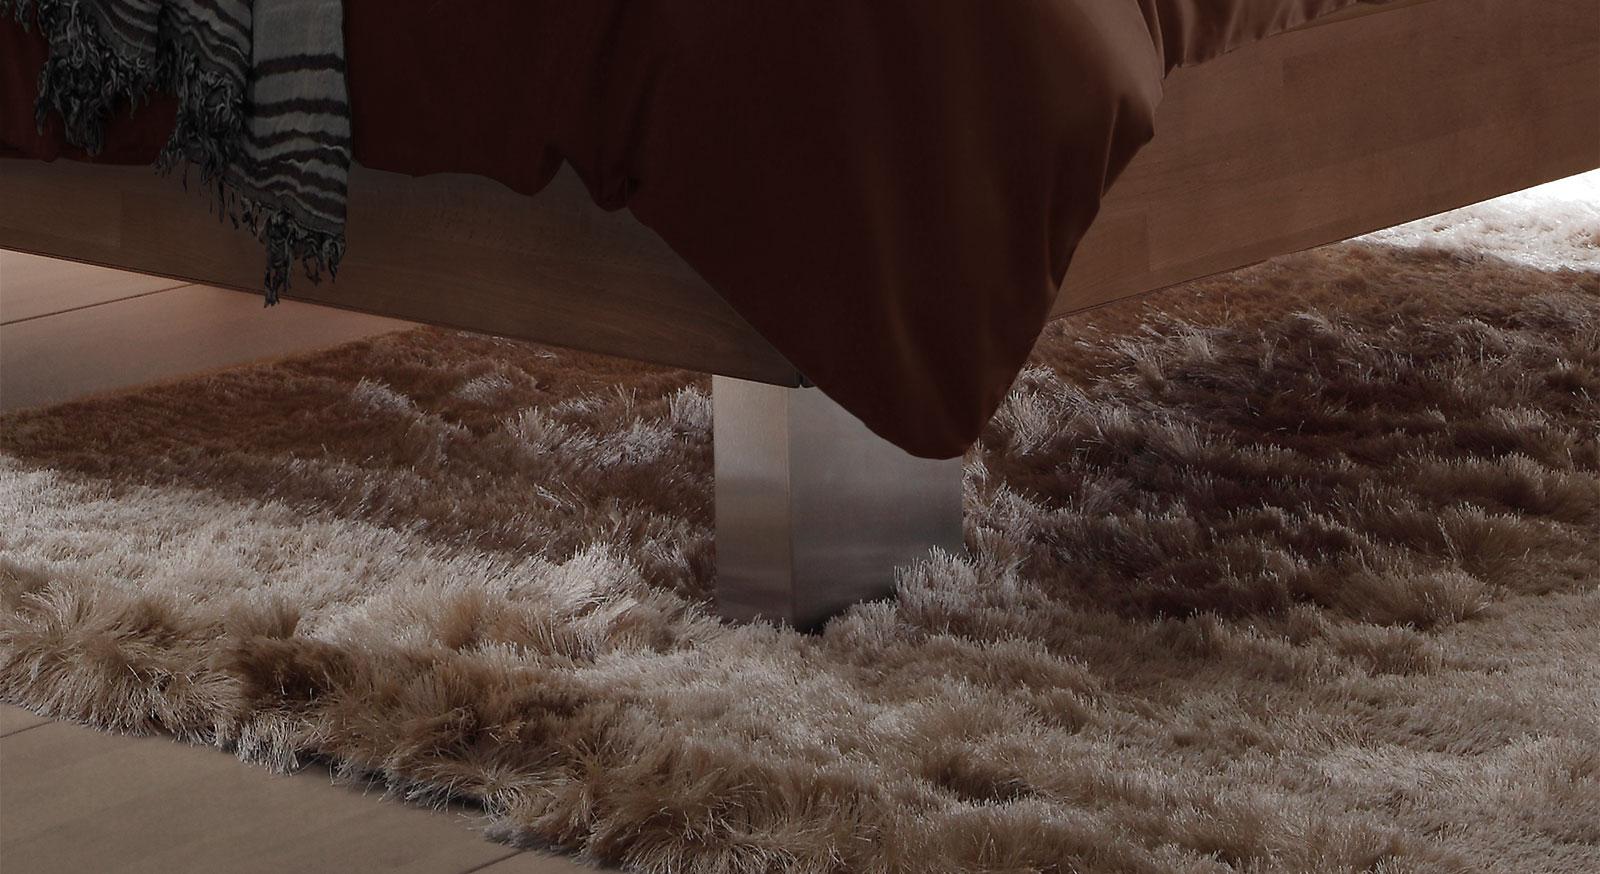 Boxspringbett Cameron mit Bettfüßen aus gebürstetem Edelstahl